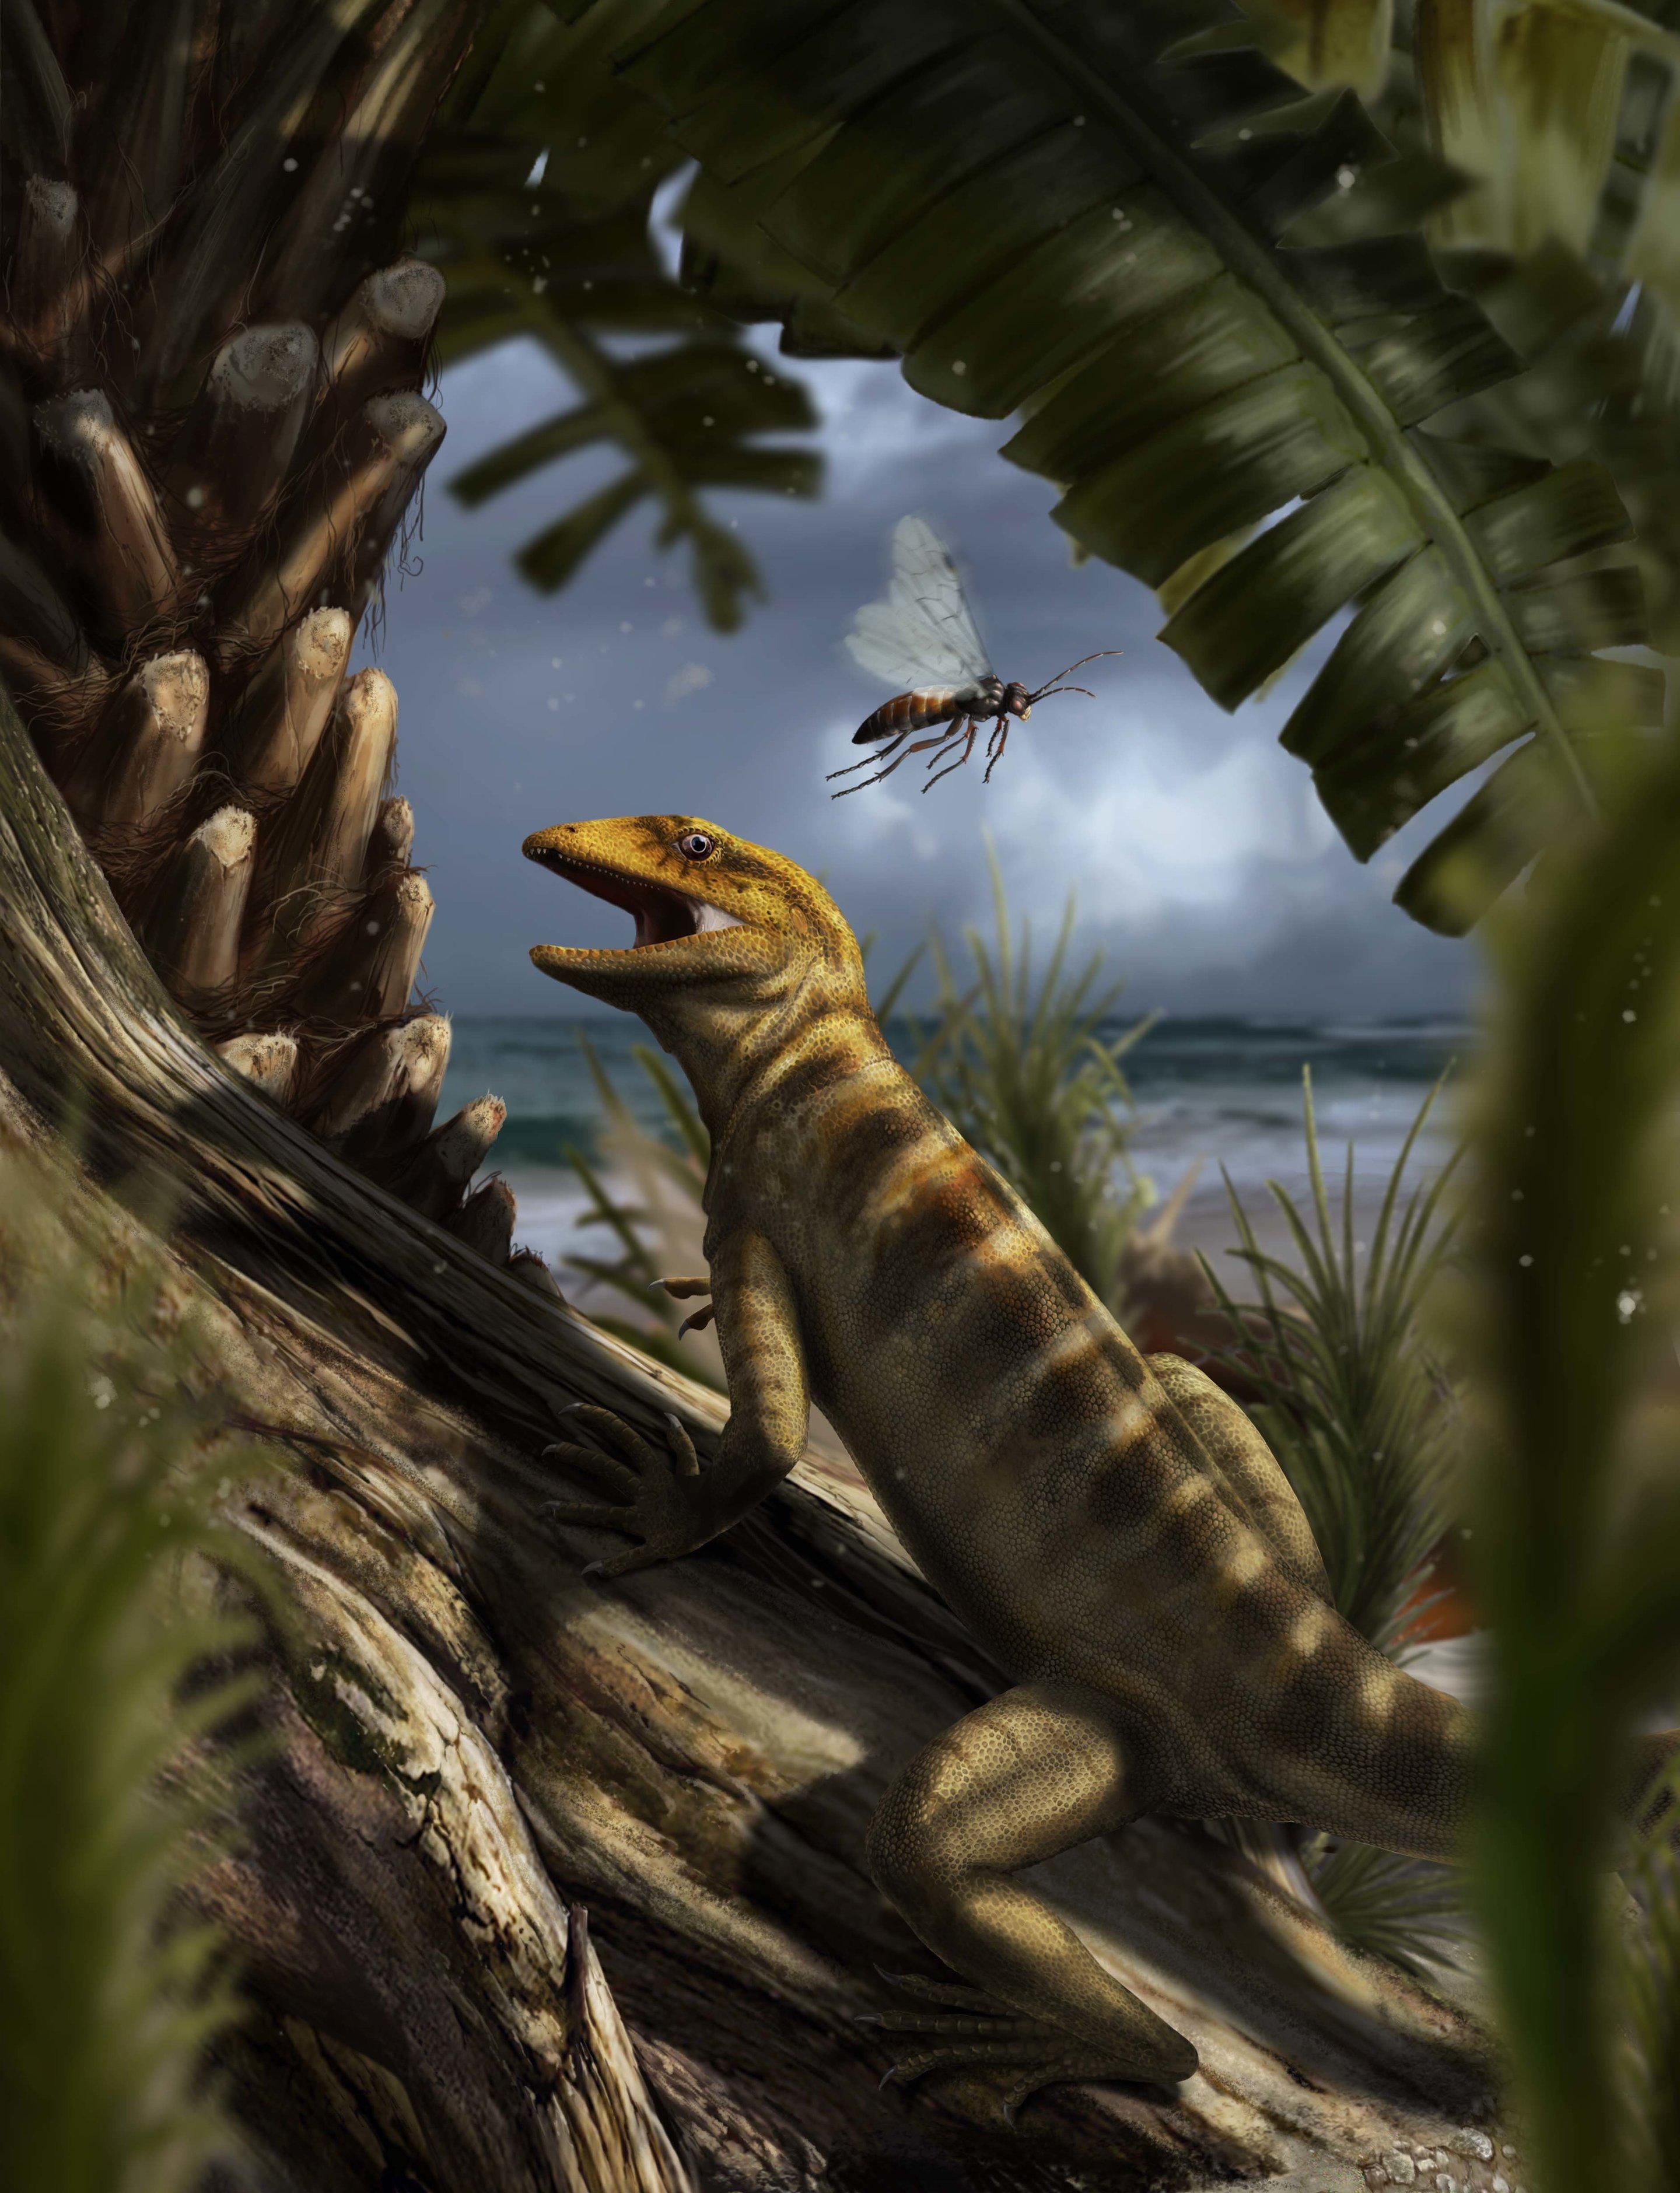 Ancient reptiles: the origin and extinction 37